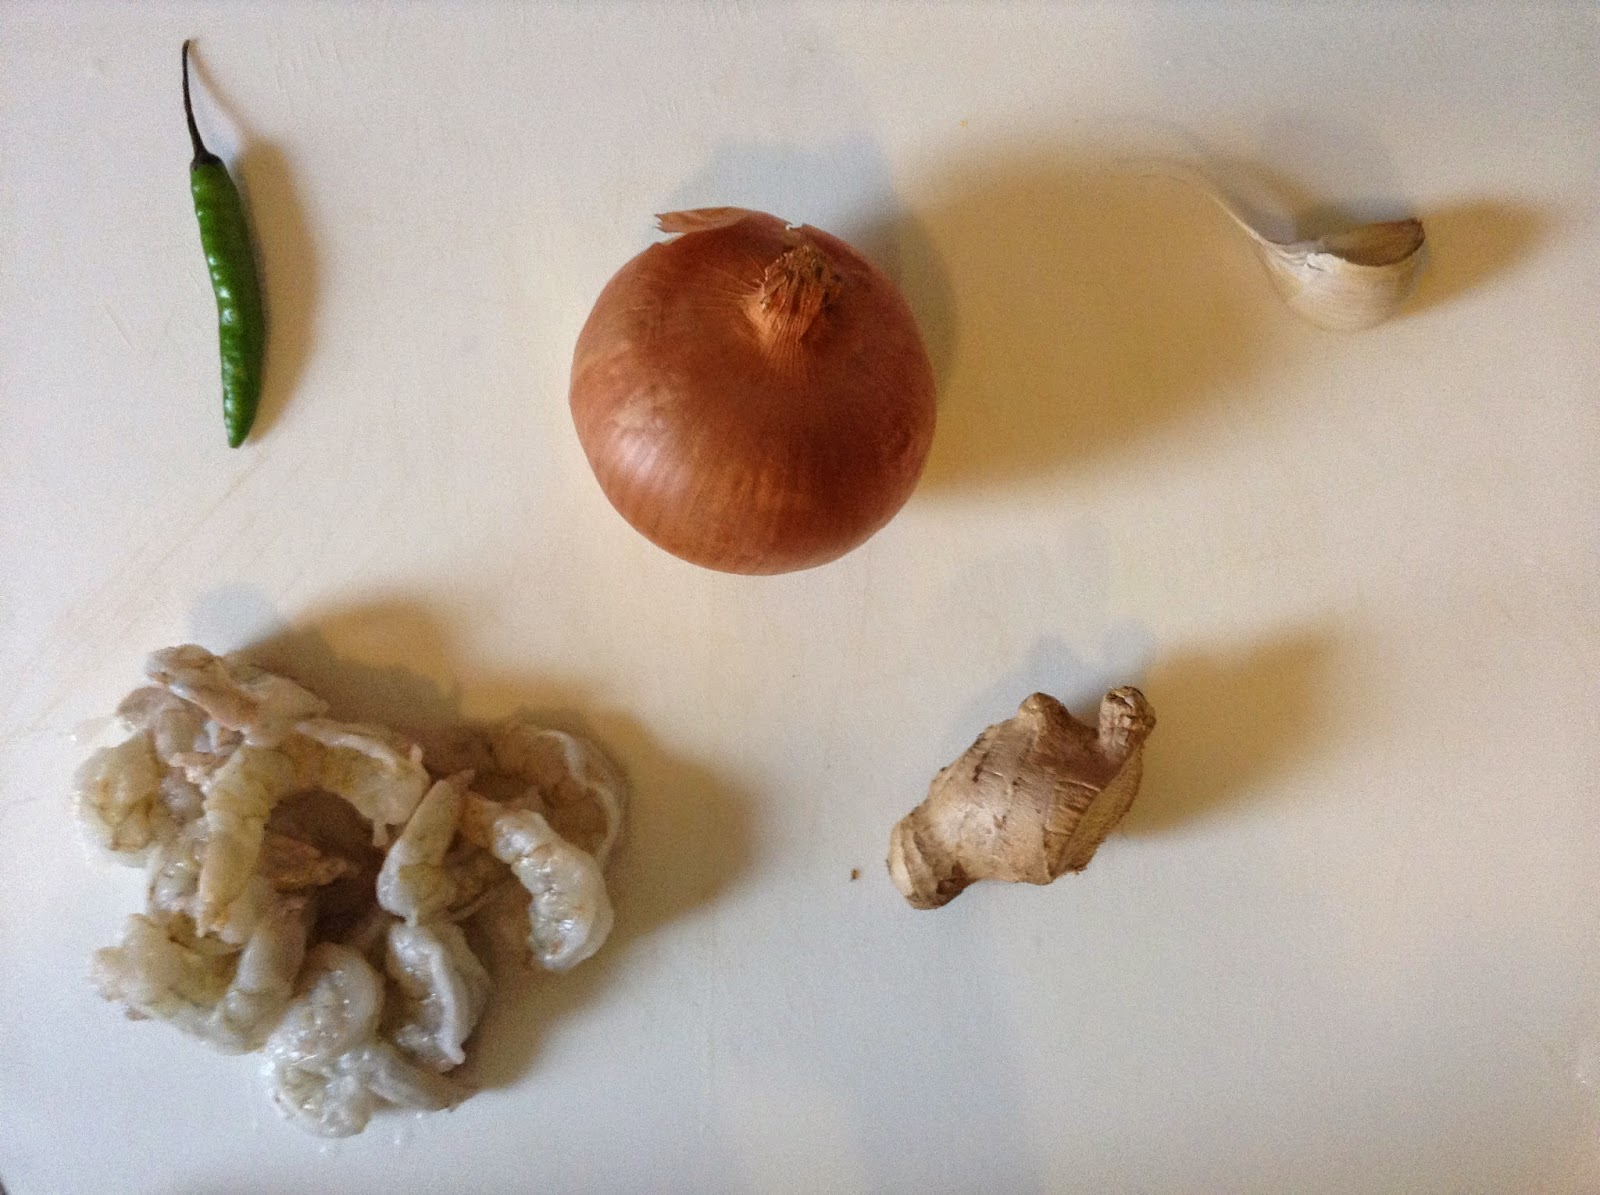 Shrimps, chili pepper, onions, garlic on a white chopping board